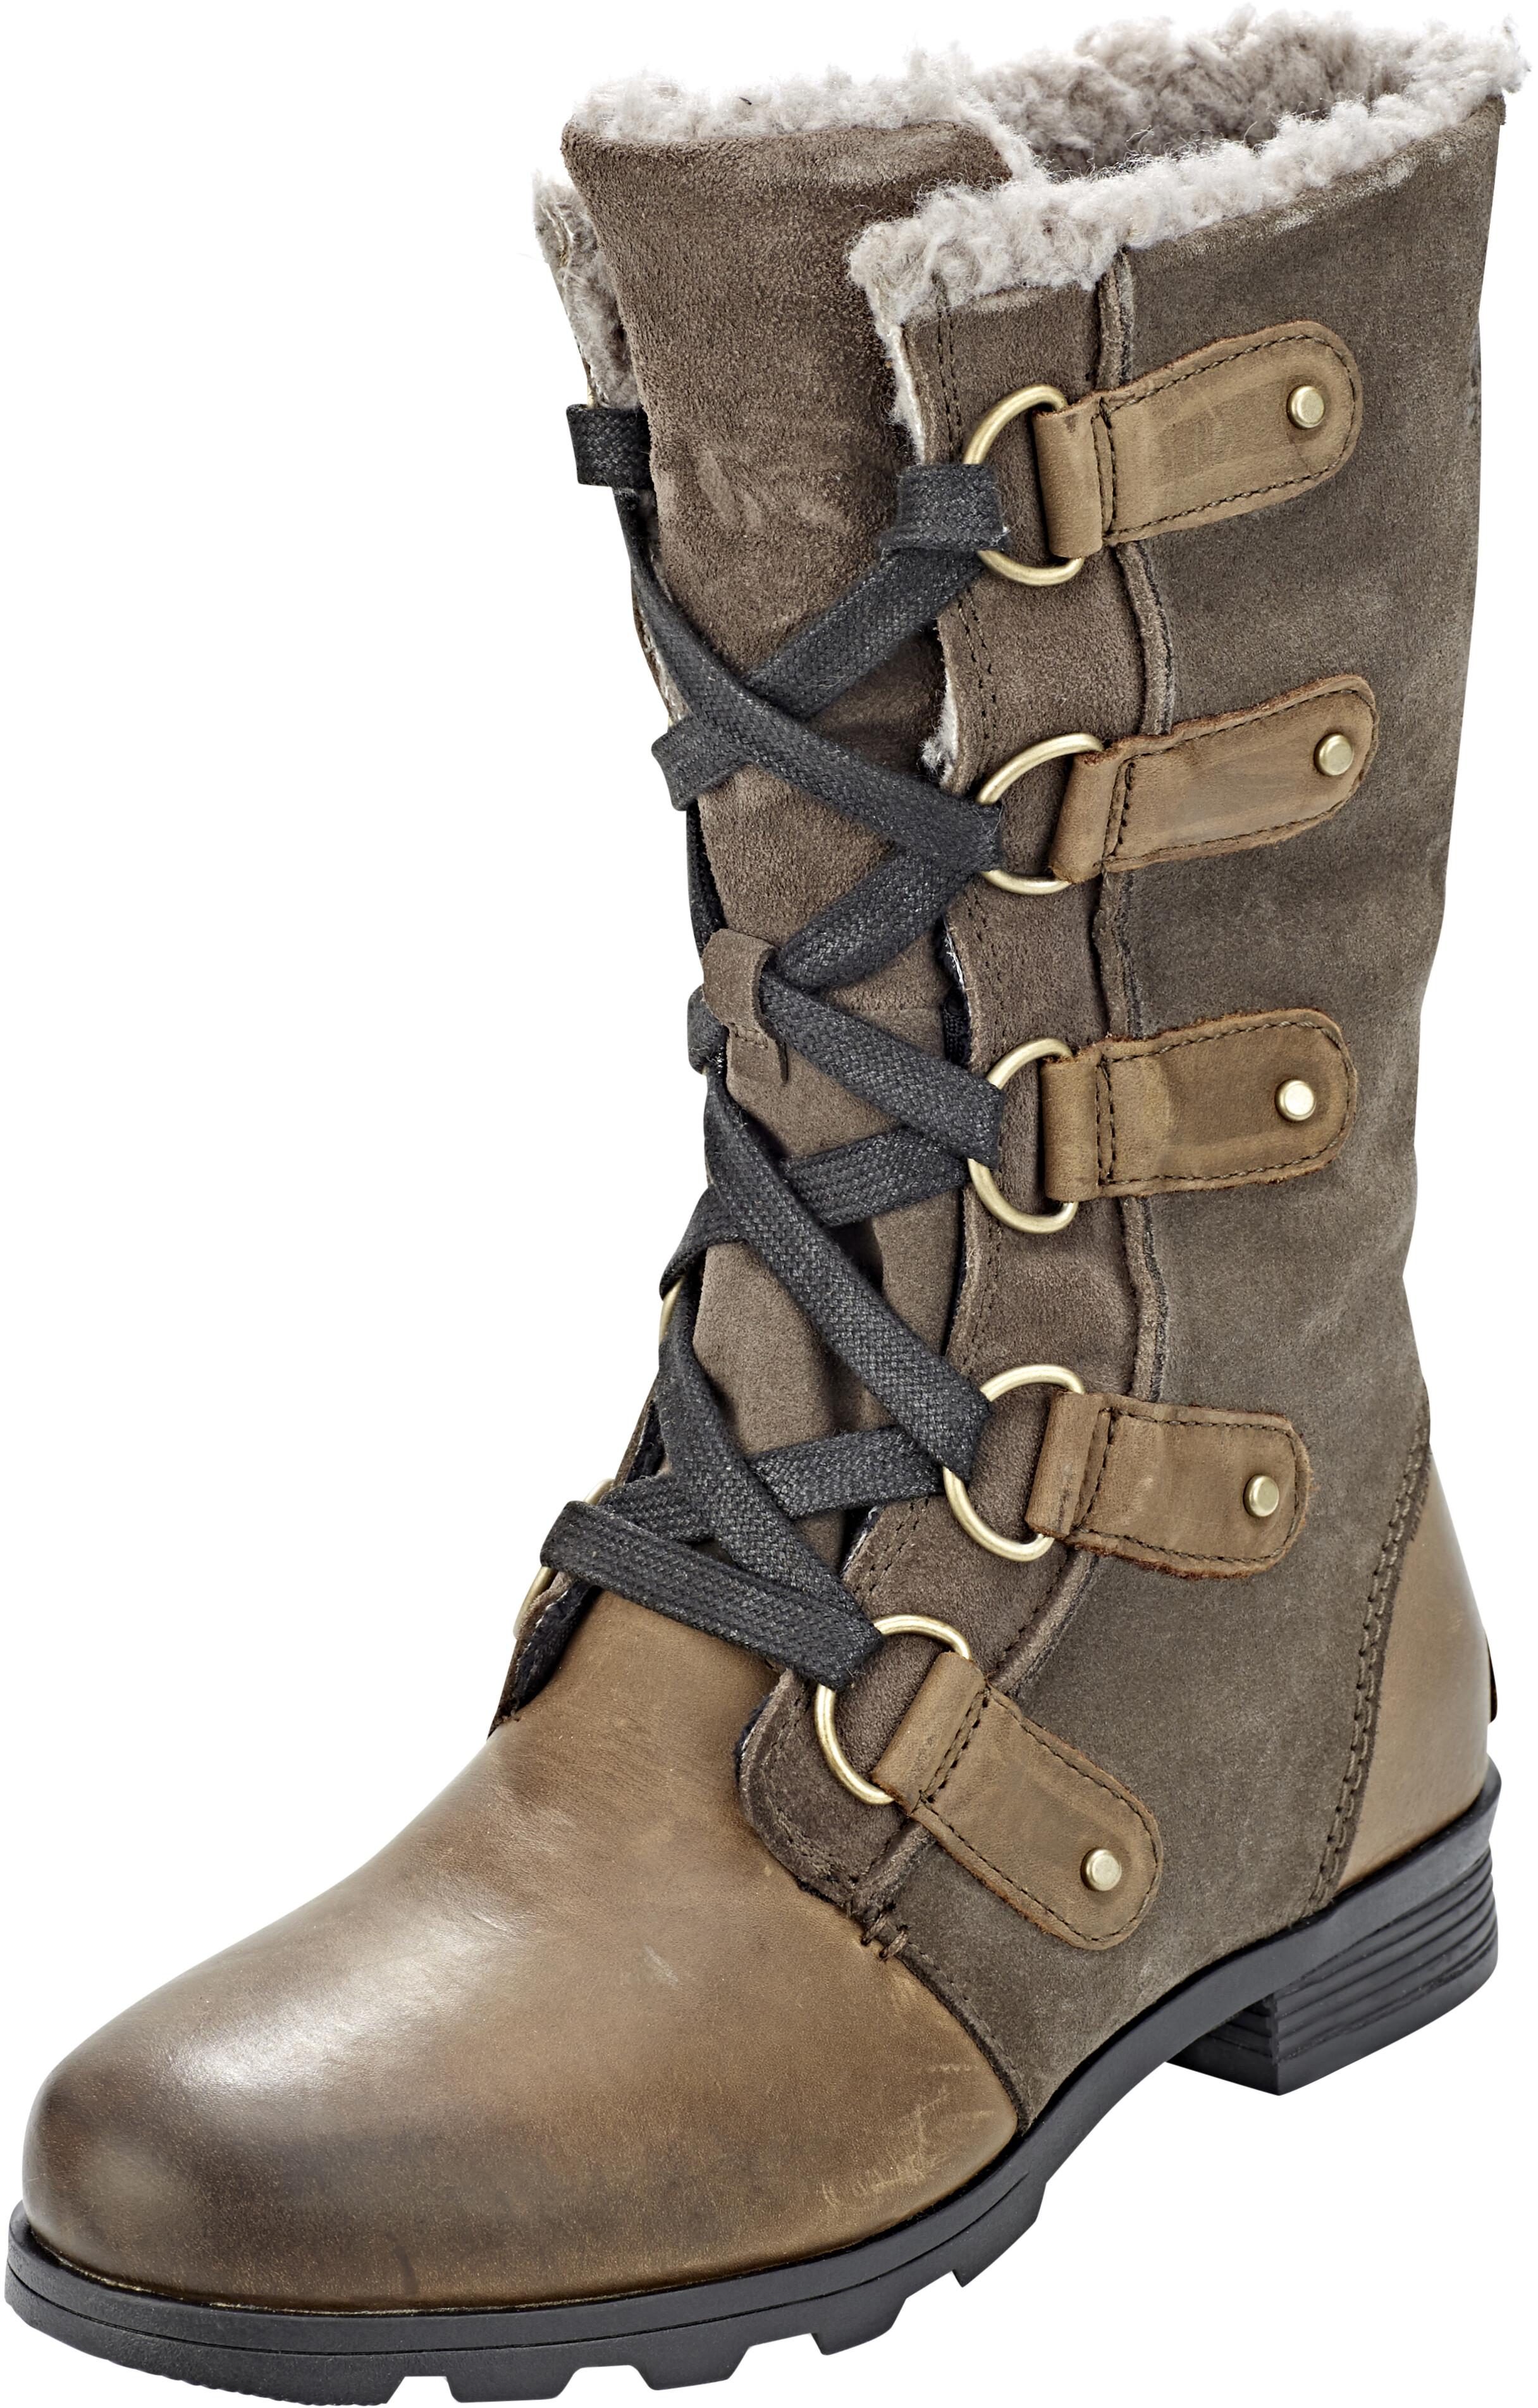 af6556698f07 Sorel Emelie Lace Boots Women brown at Addnature.co.uk